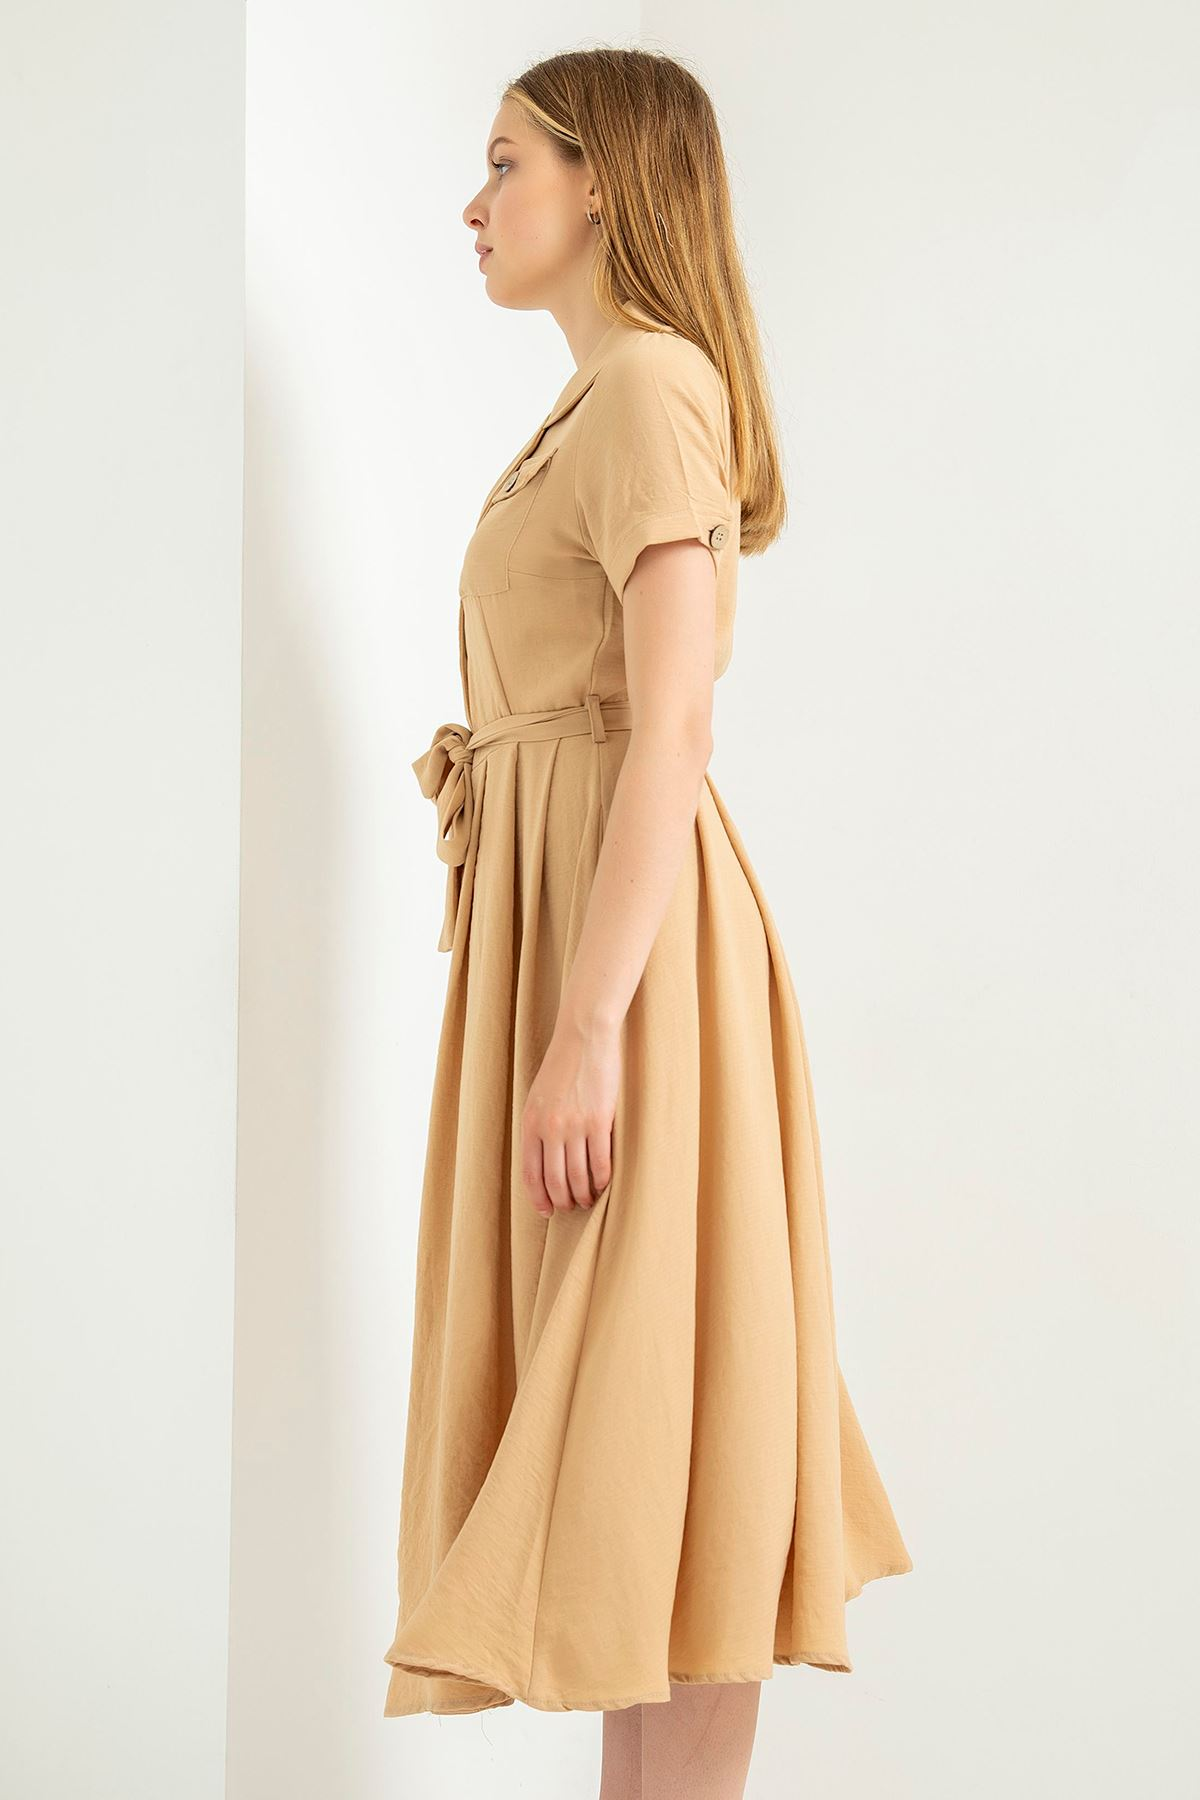 Cep Detay Elbise-Taş